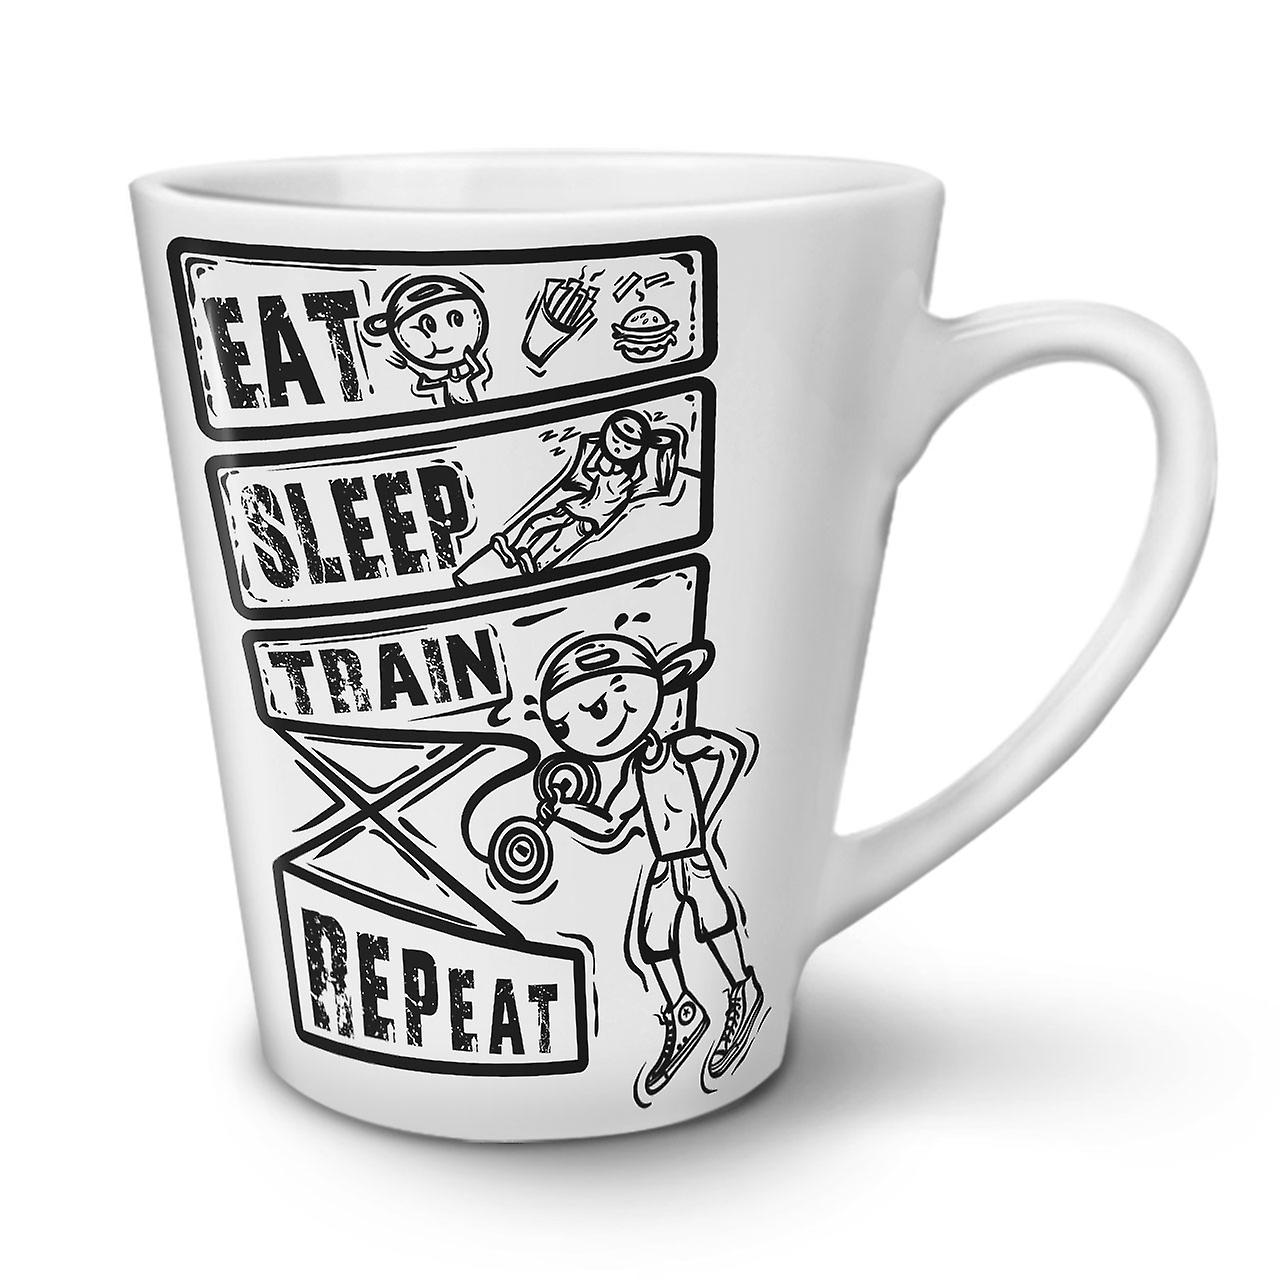 Tasse 12 En Nouvelle Latte Blanche Train Sleep OzWellcoda Café Eat Céramique dxBoeC